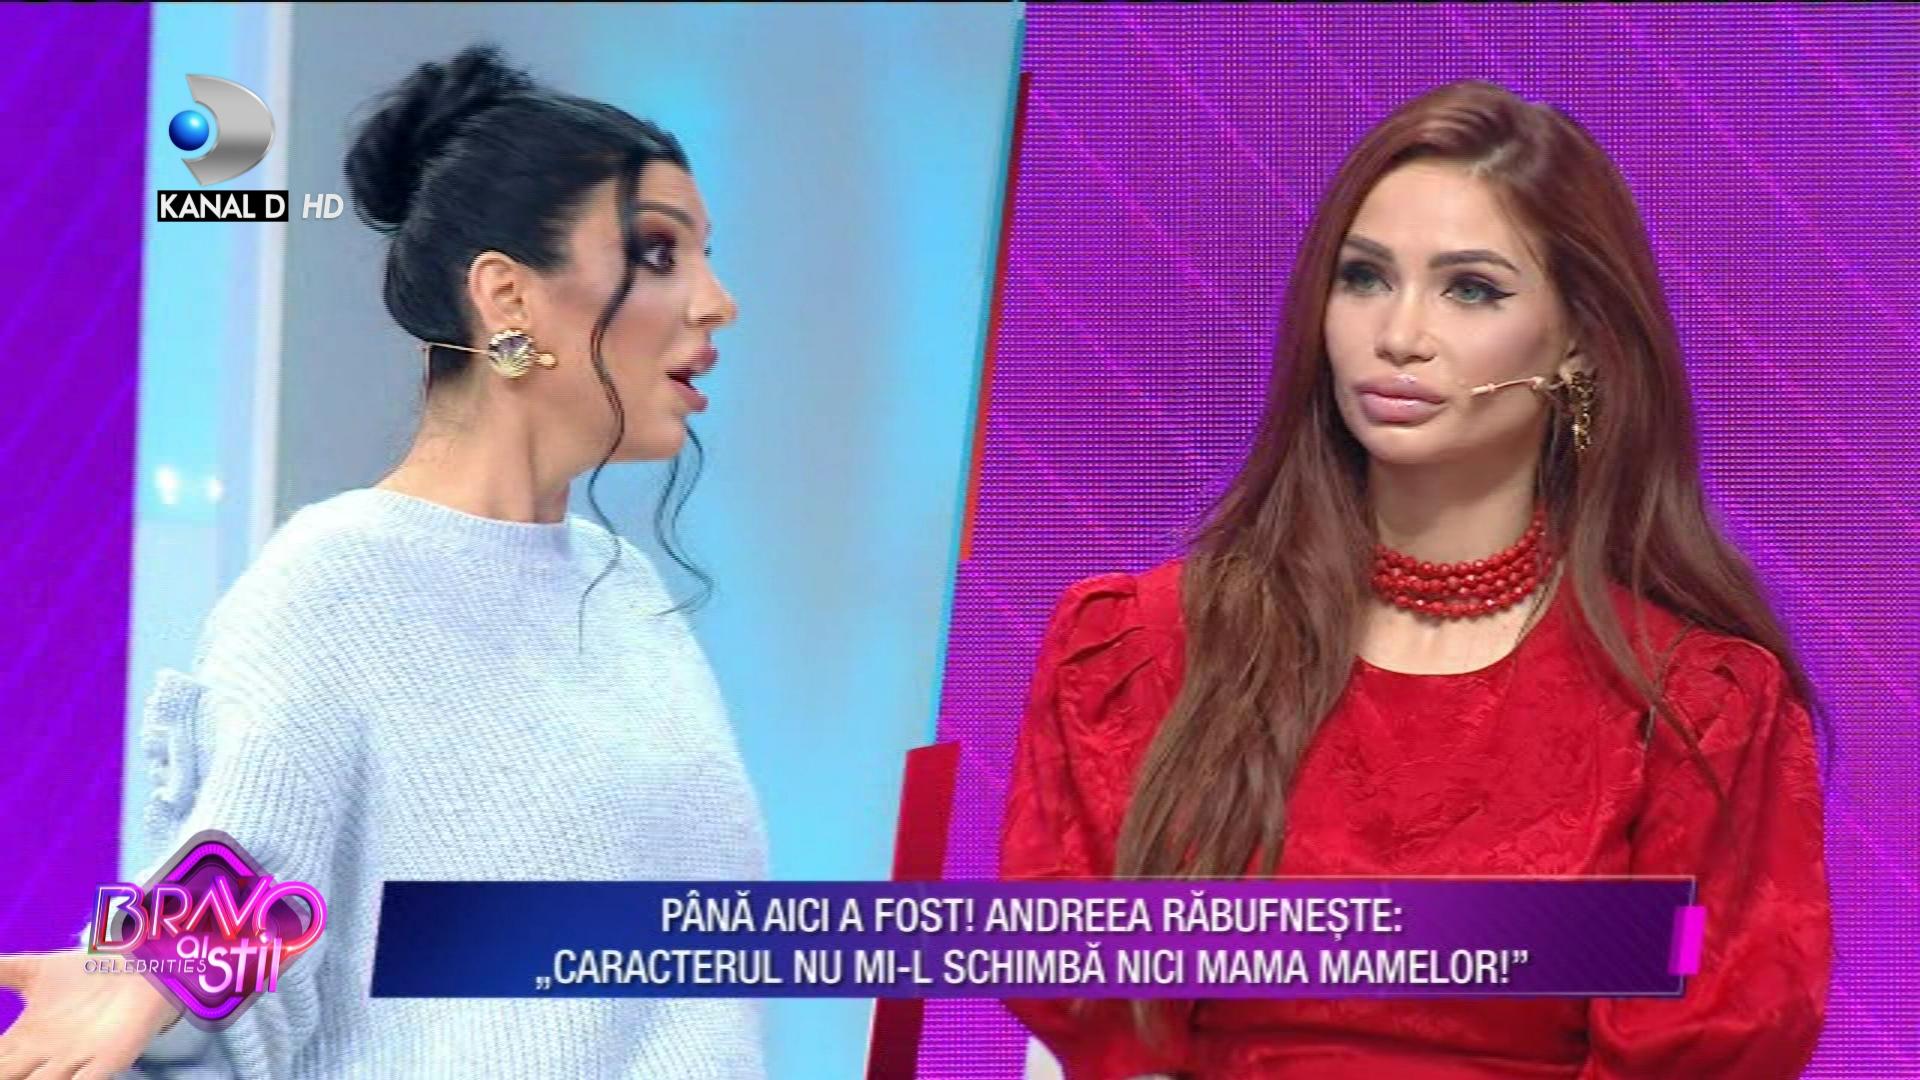 Andreea Tonciu si Maria Ilioiu isi disputa celebritatea! Care este mai indragita de publicul larg?